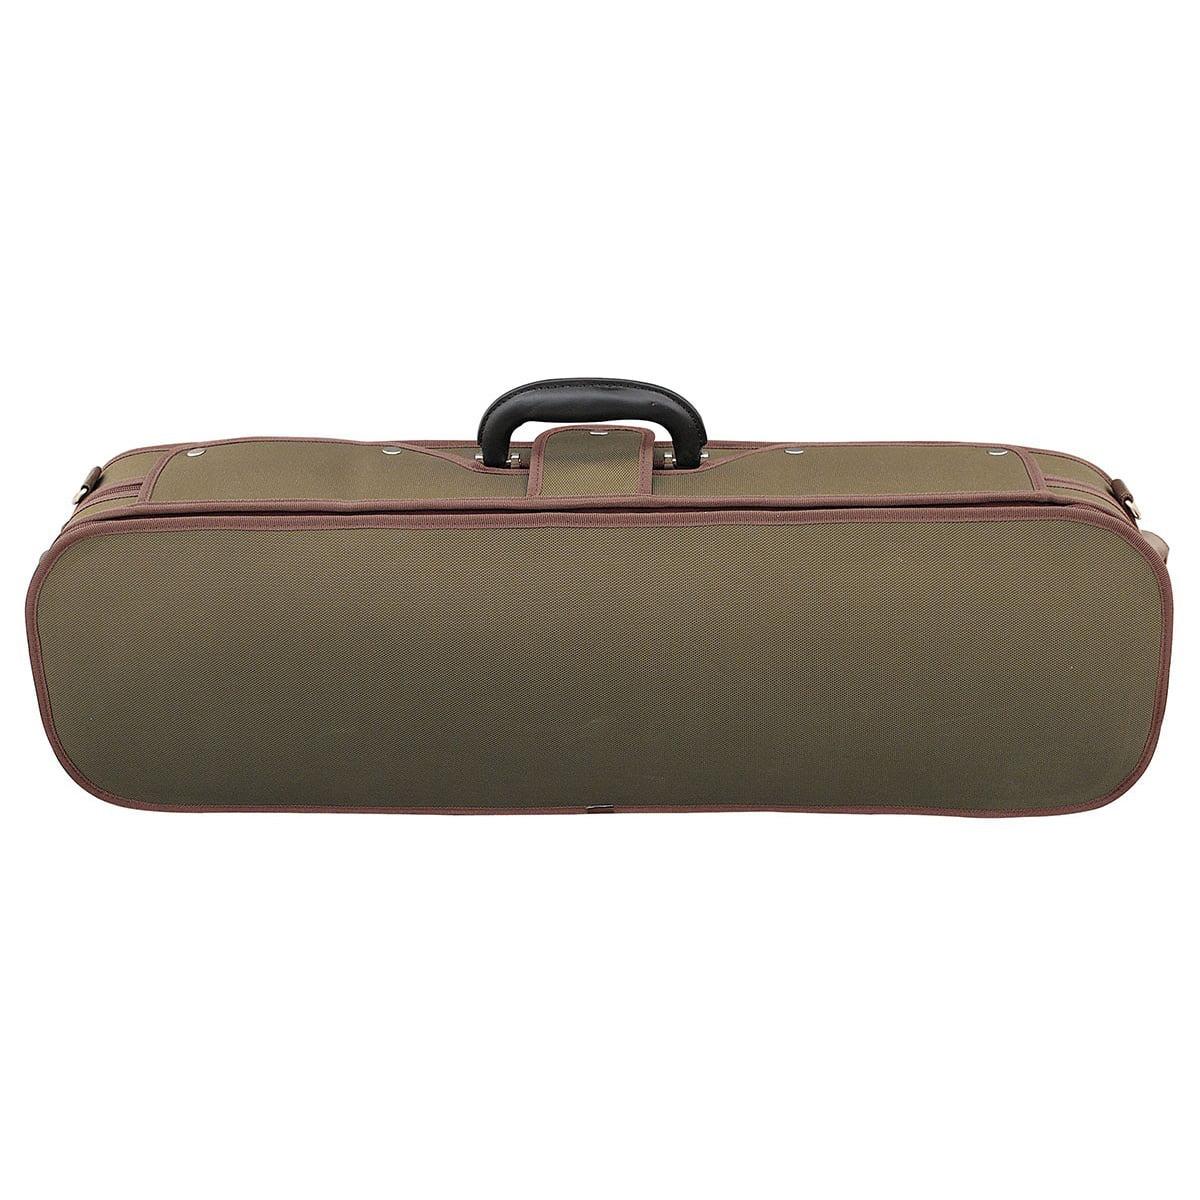 Hidersine Case Violin 4/4 Light Oblong VC802 Exterior